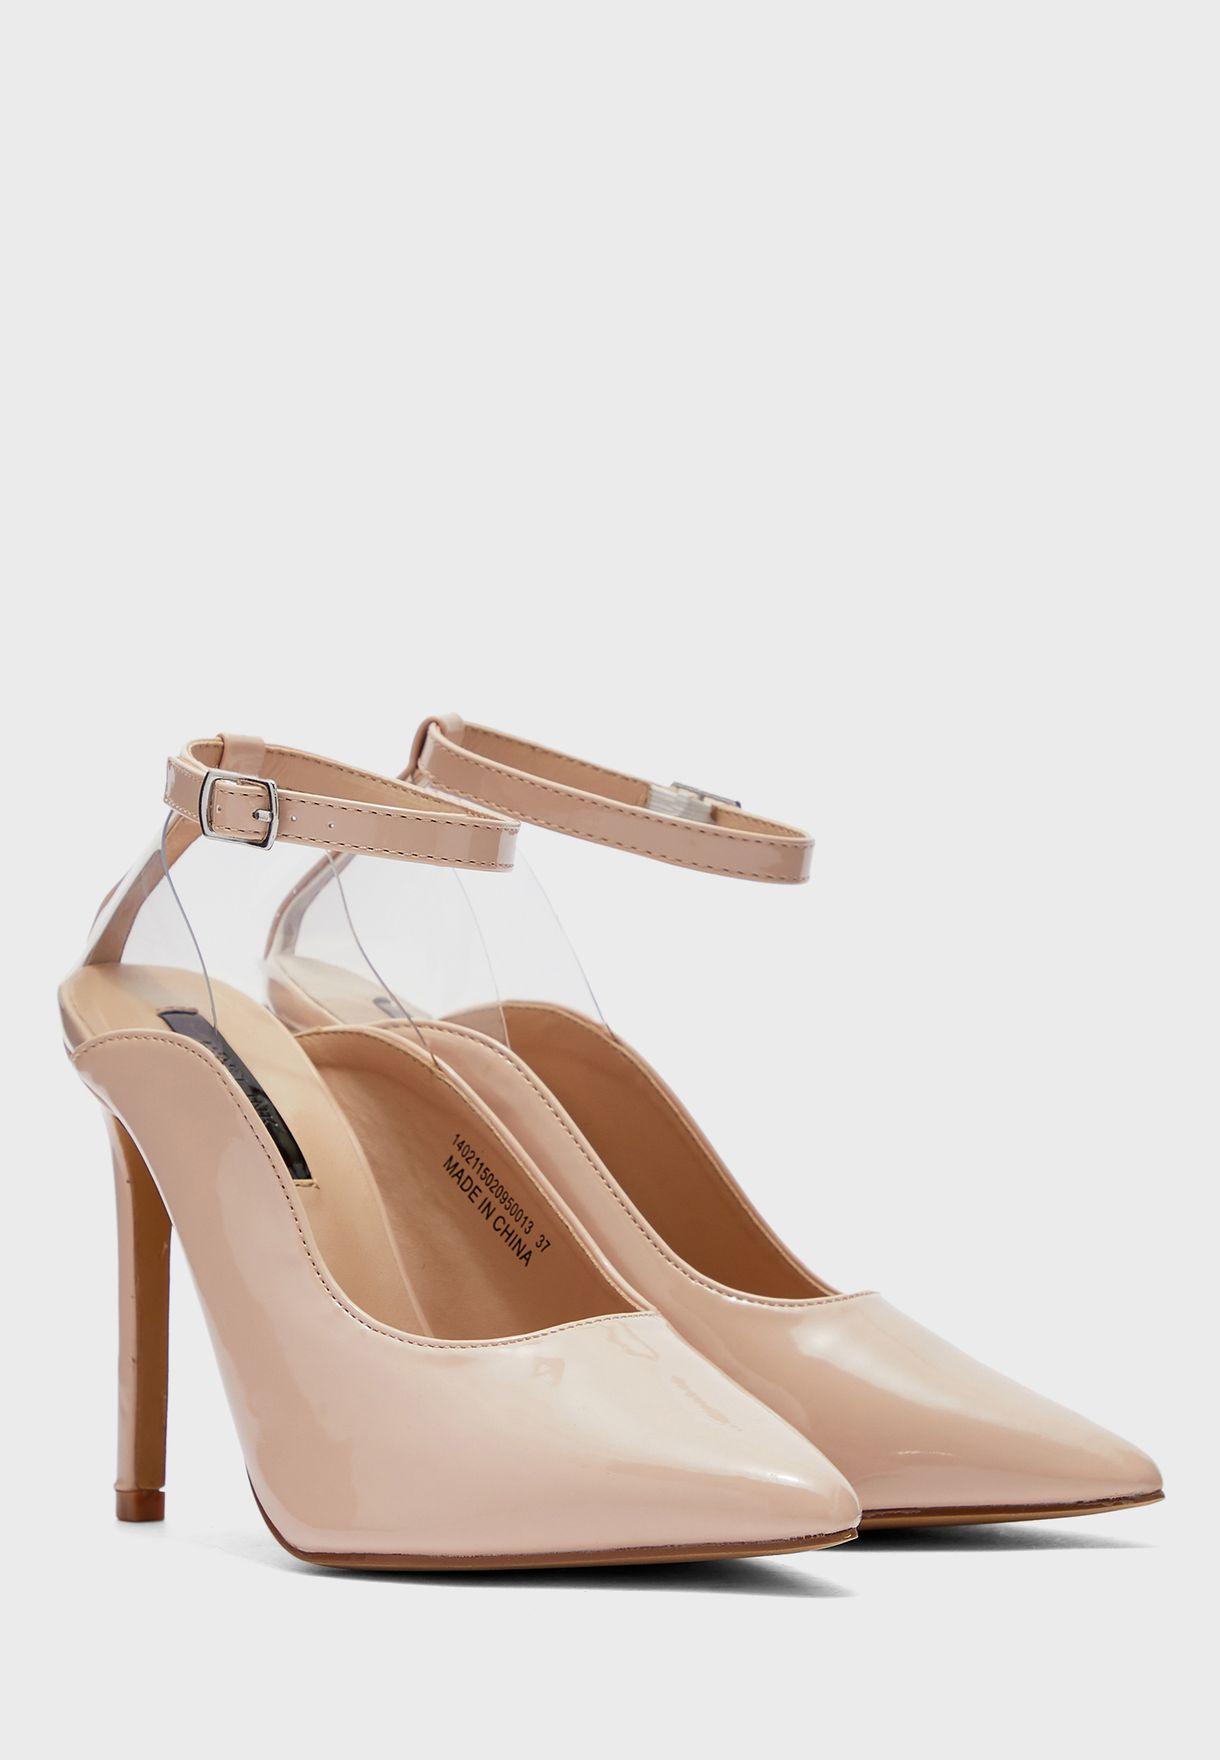 Transparent Slingback High Heel Pump